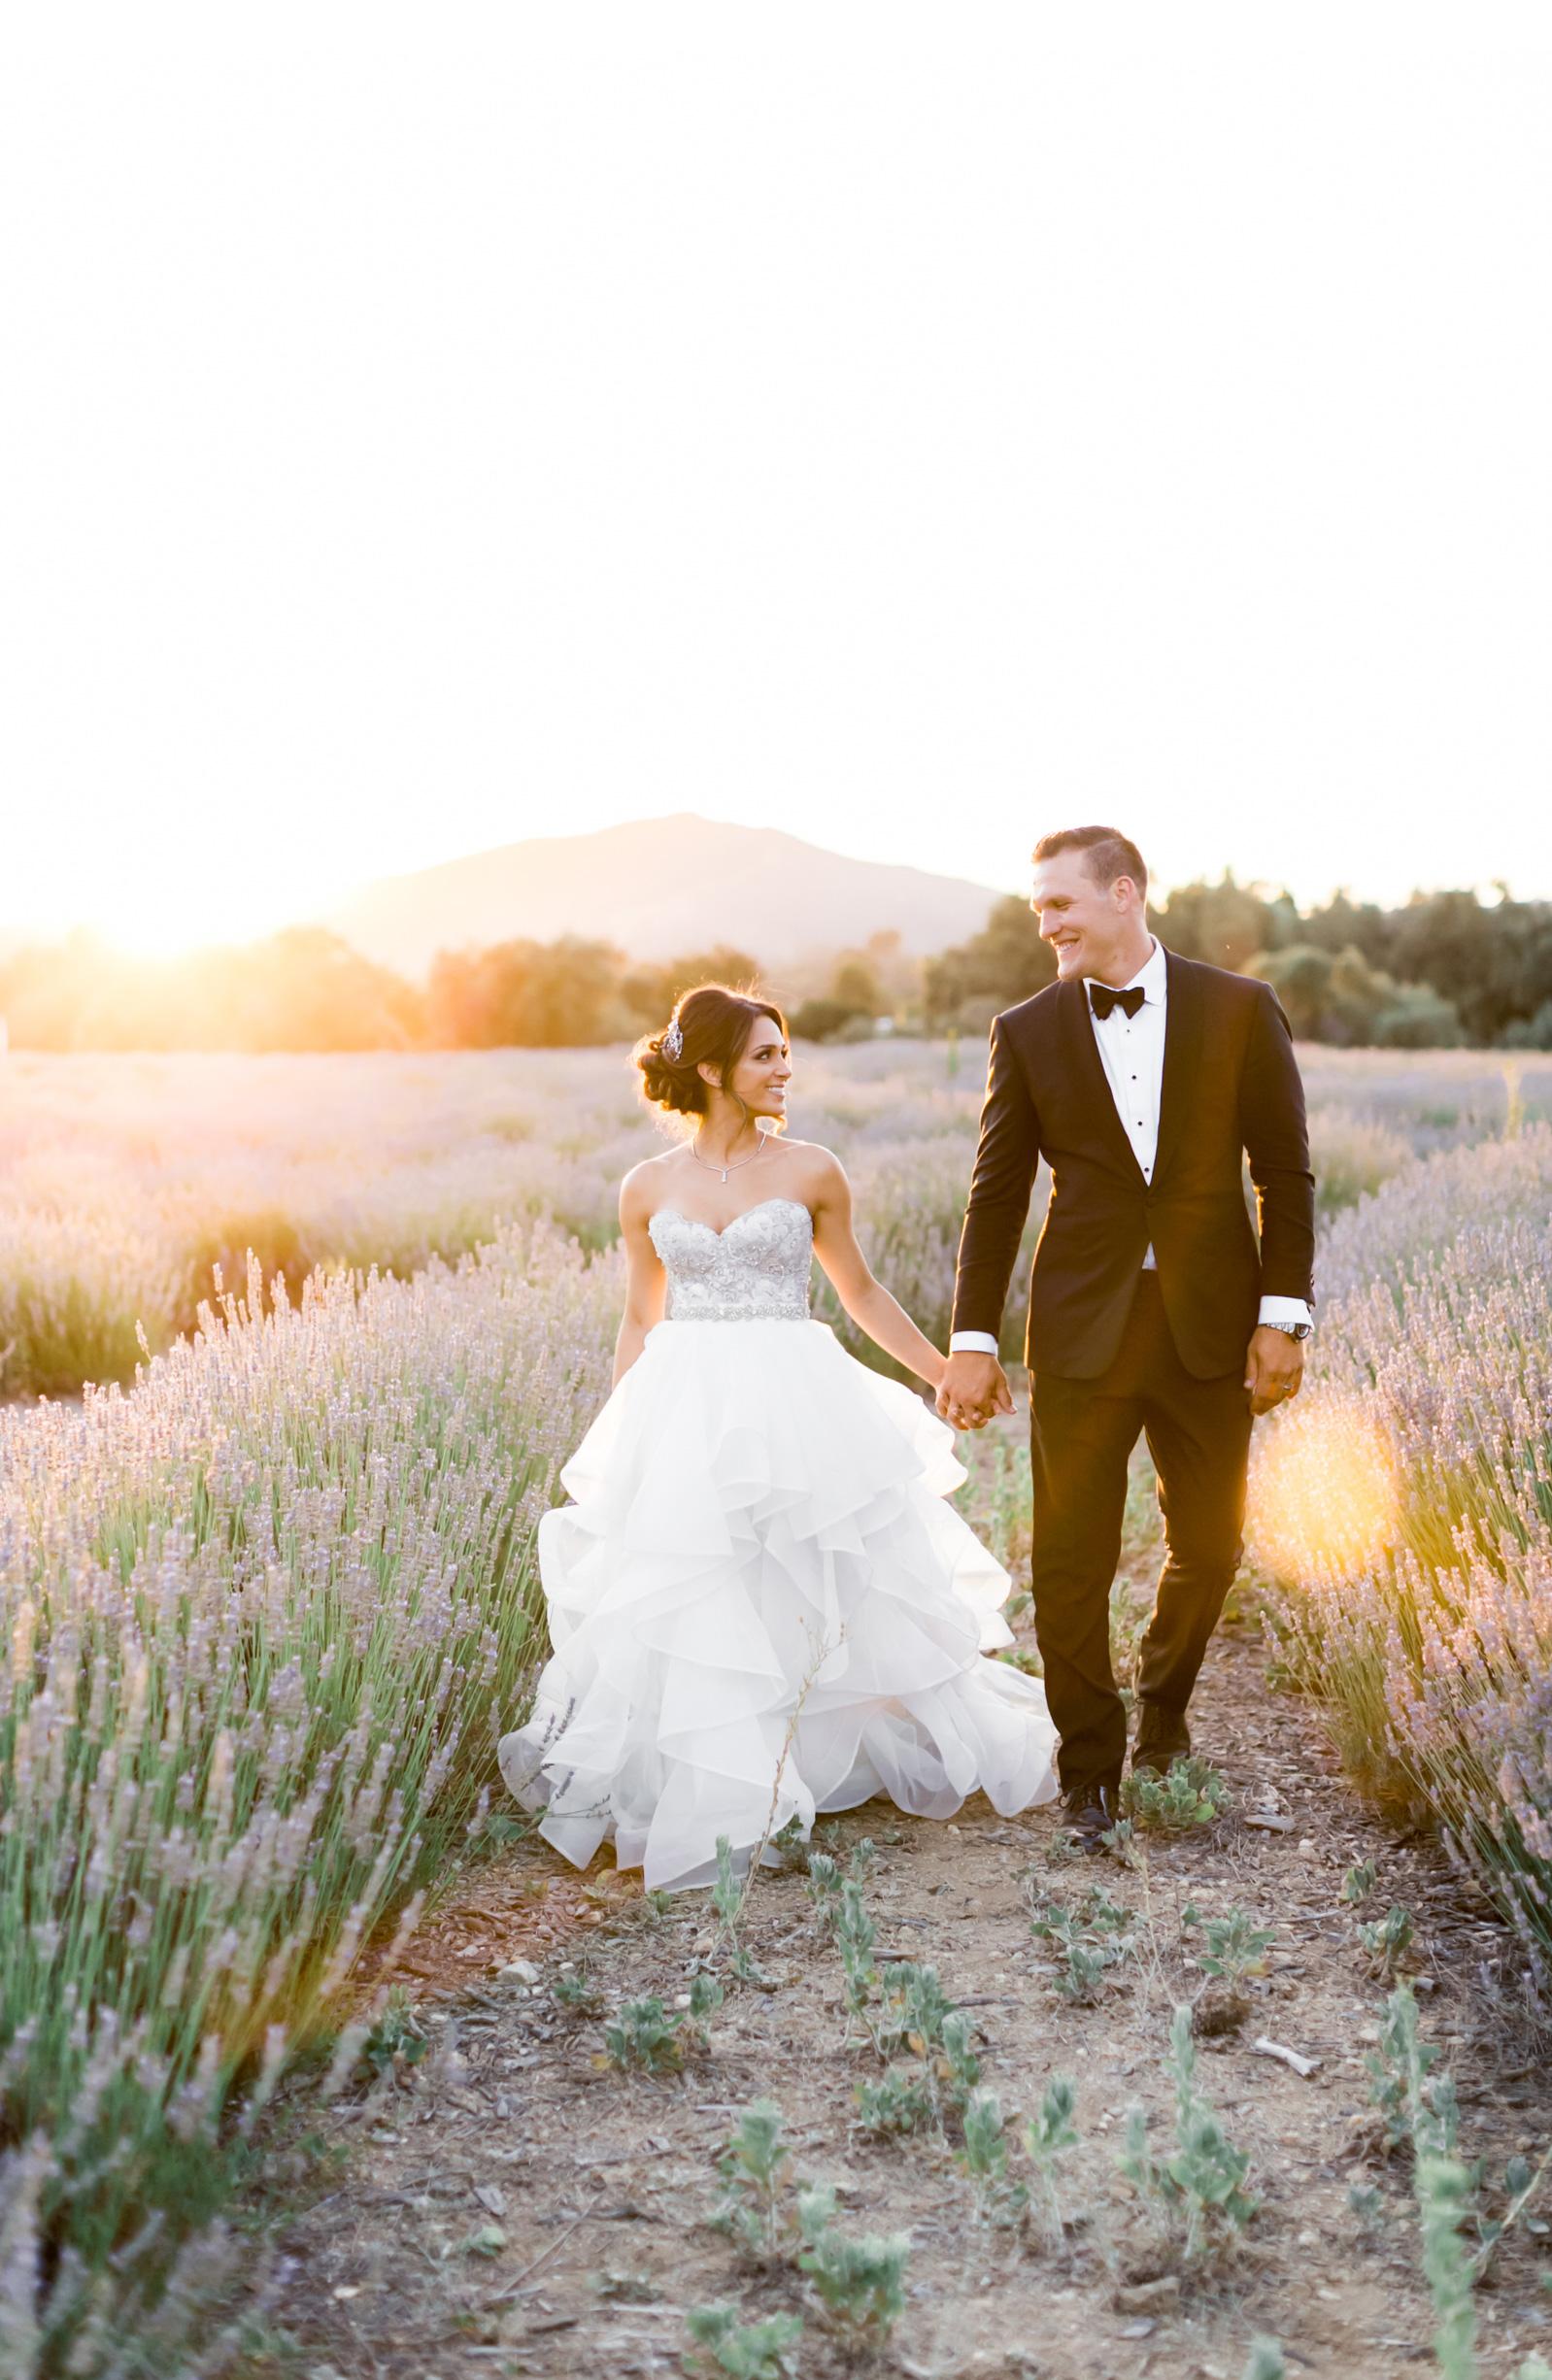 California-Lavender-Field-Wedding-Natalie-Schutt-Photography-Style-Me-Pretty_15.jpg